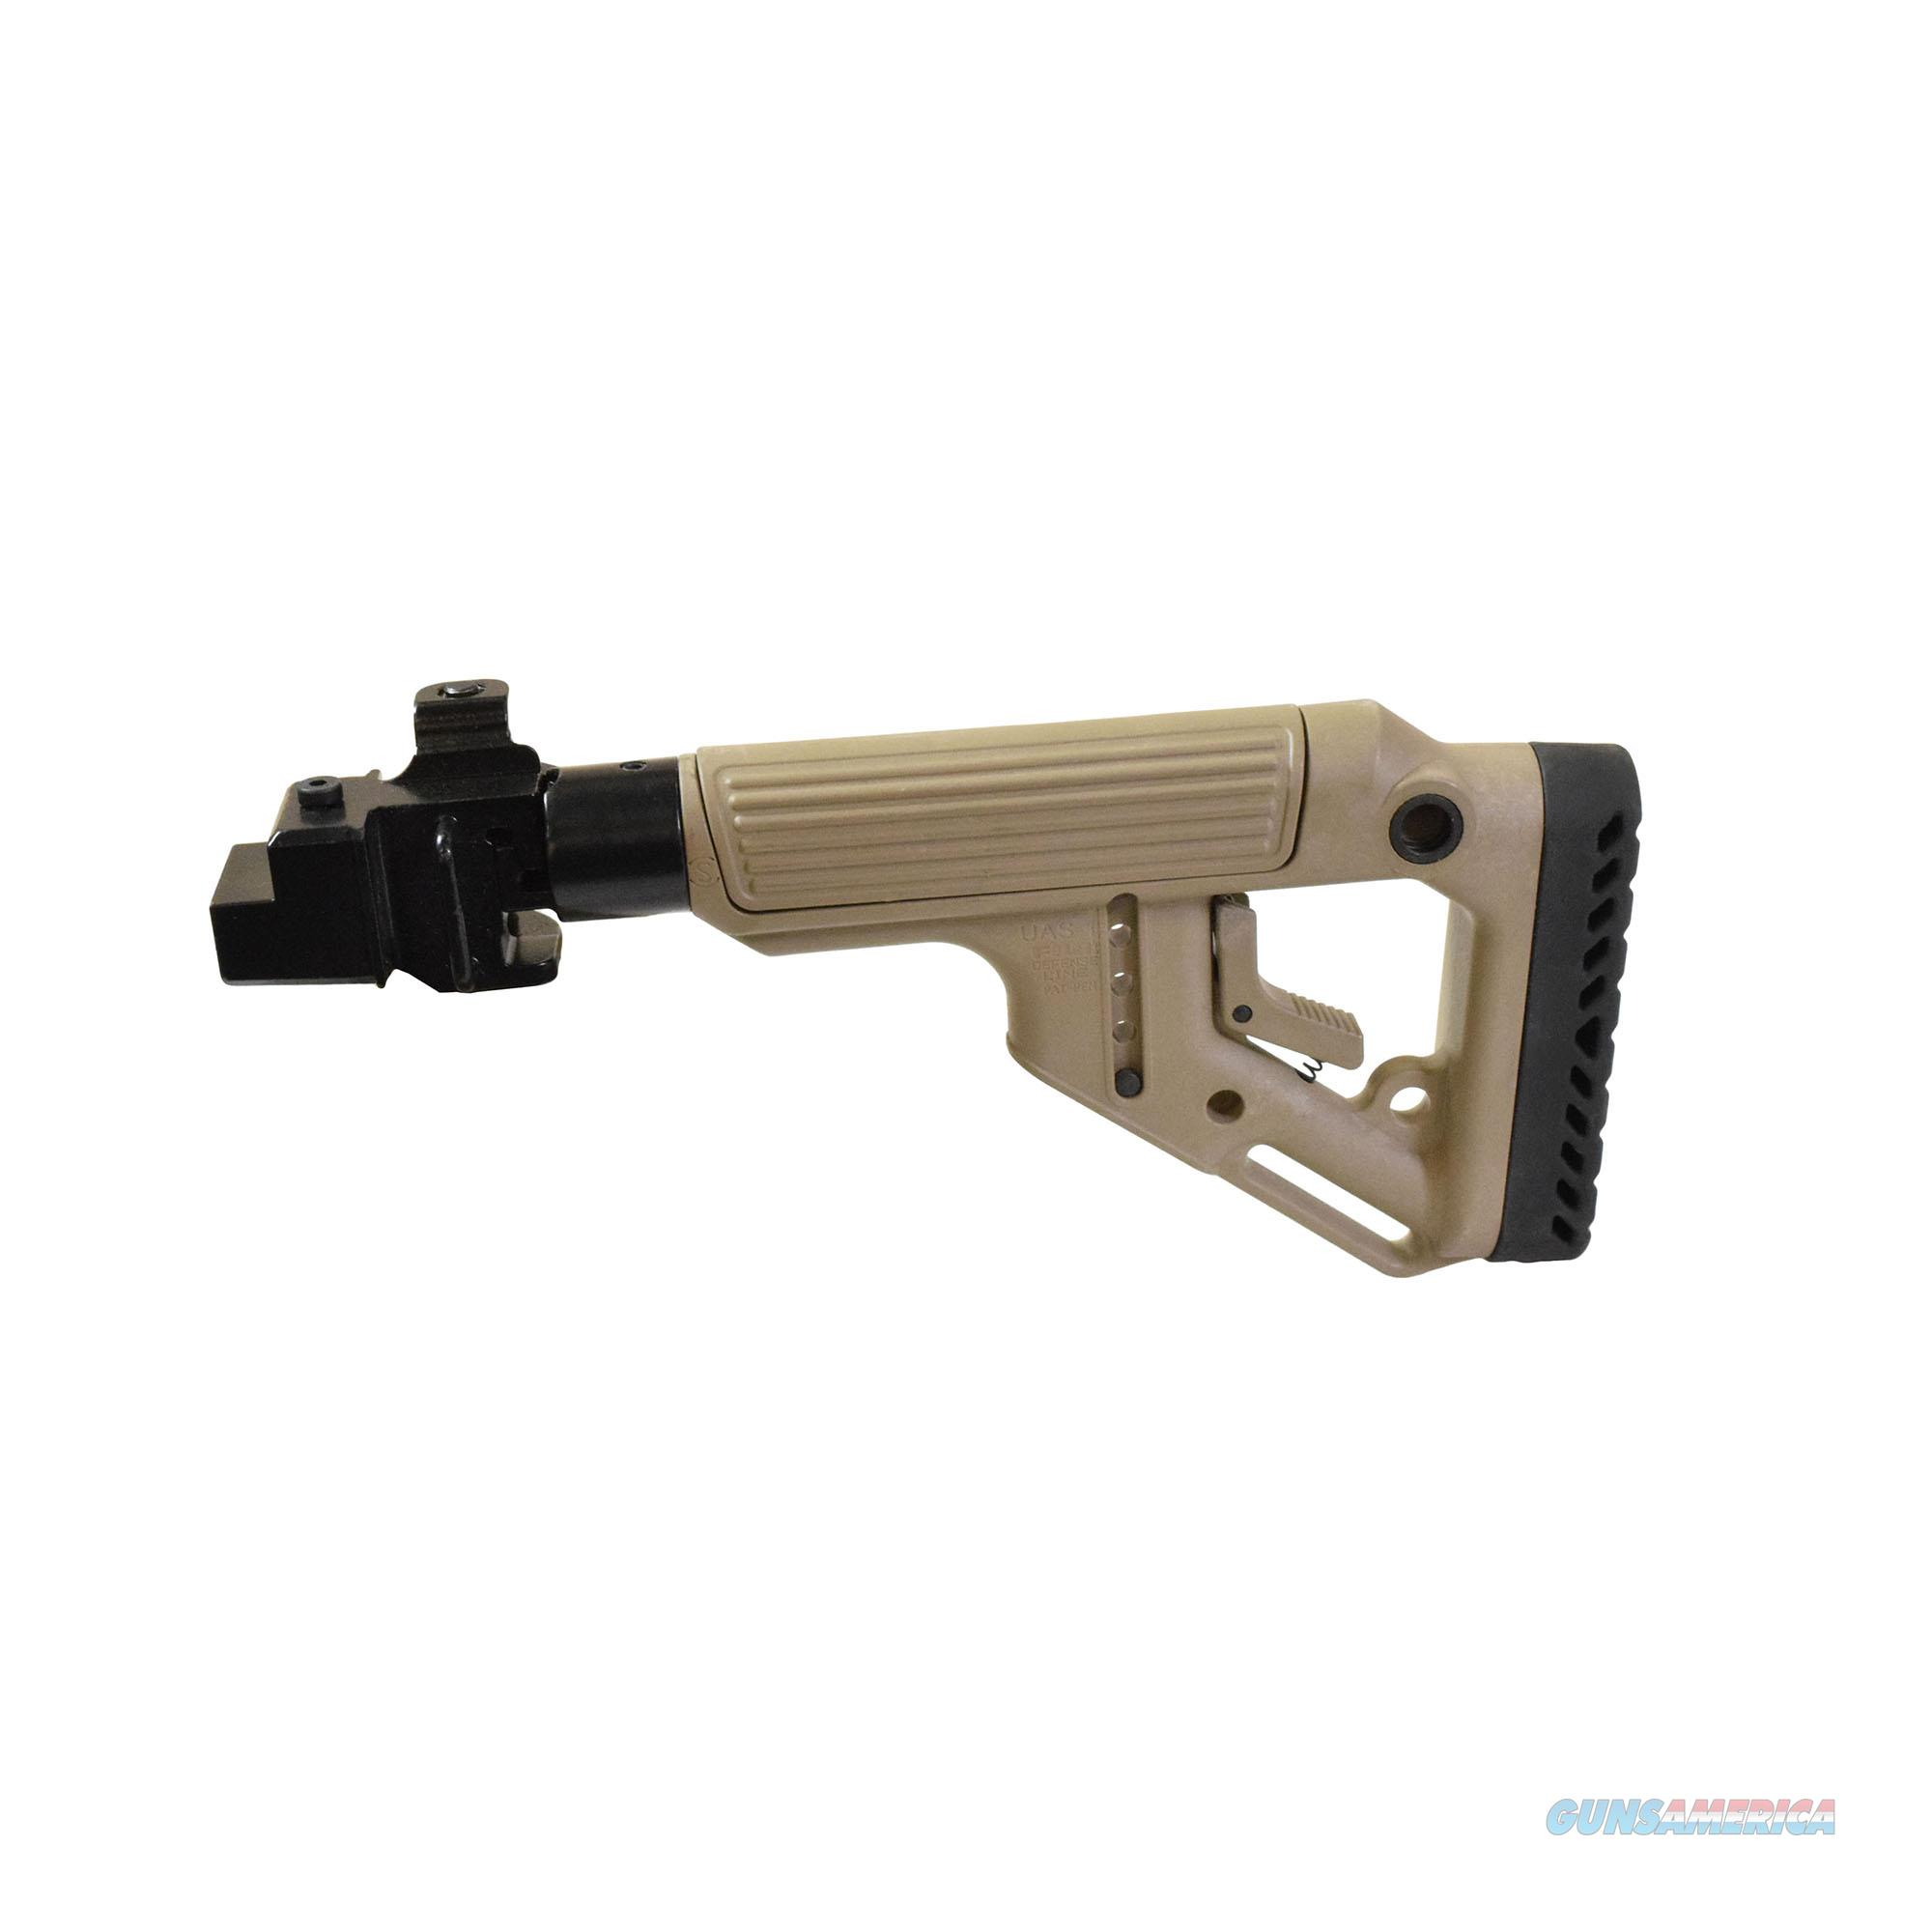 Mako Group Tactical Folding Buttstock With Cheek Riser UAS-AK-FDE  Non-Guns > Gunstocks, Grips & Wood